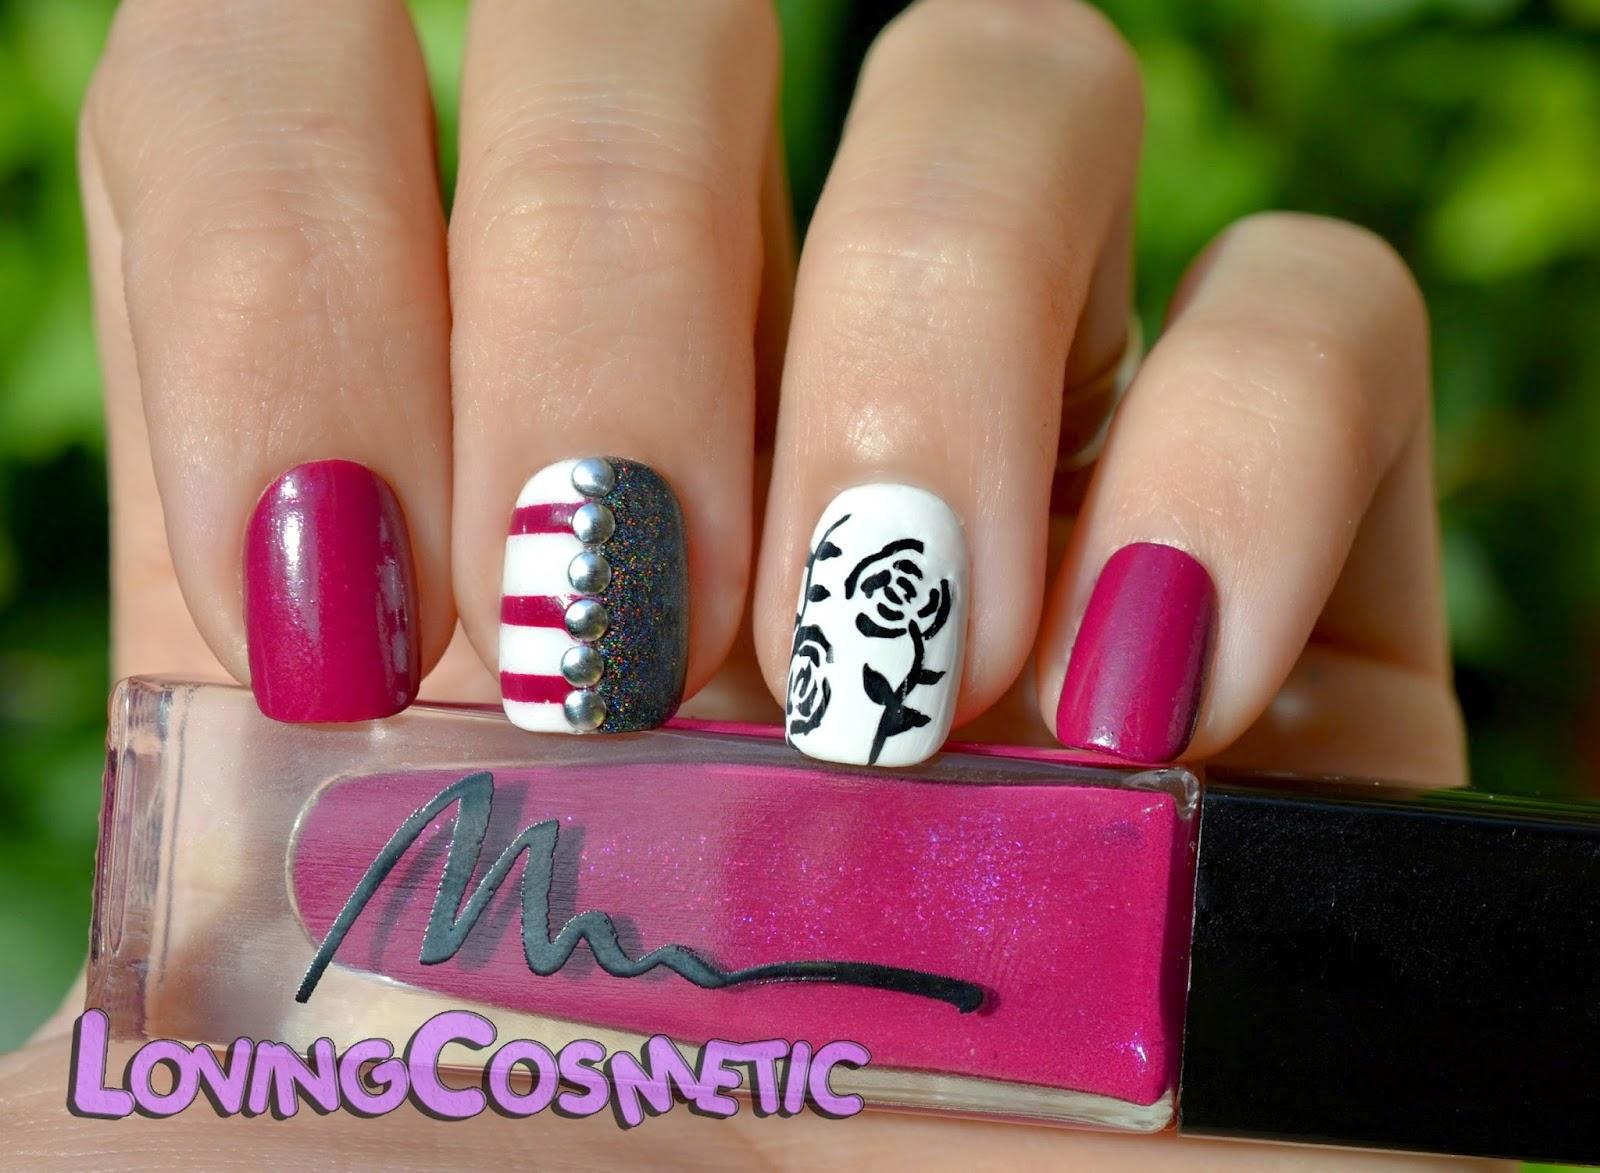 Nail Nails art diseño uñas black roses acrylic marionnaud esmaltes color club